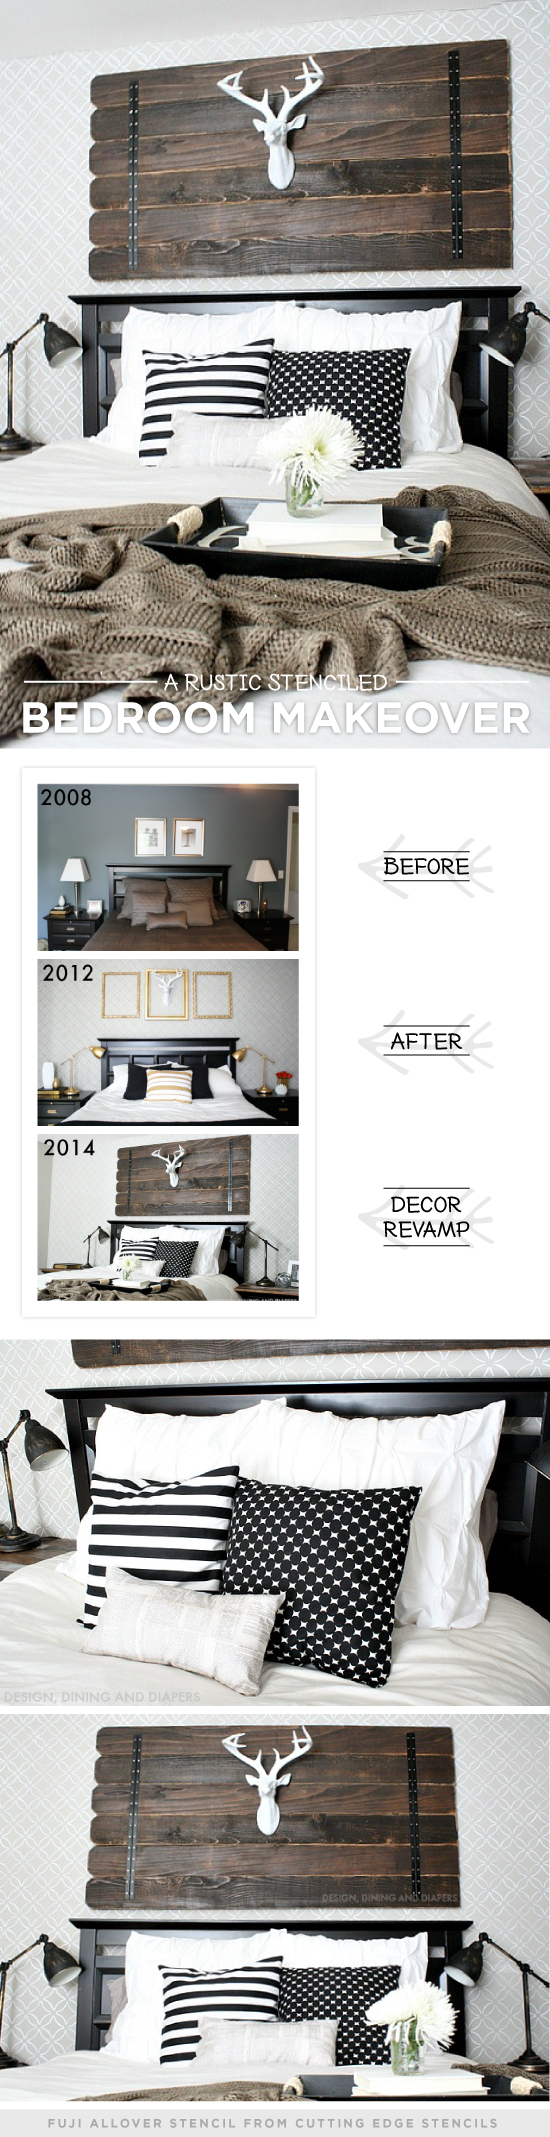 Cutting Edge Stencils share a DIY rustic and cozy stenciled master bedroom using the Fuji Allover Stencil. http://www.cuttingedgestencils.com/stencil-wall-stencils-fuji.html